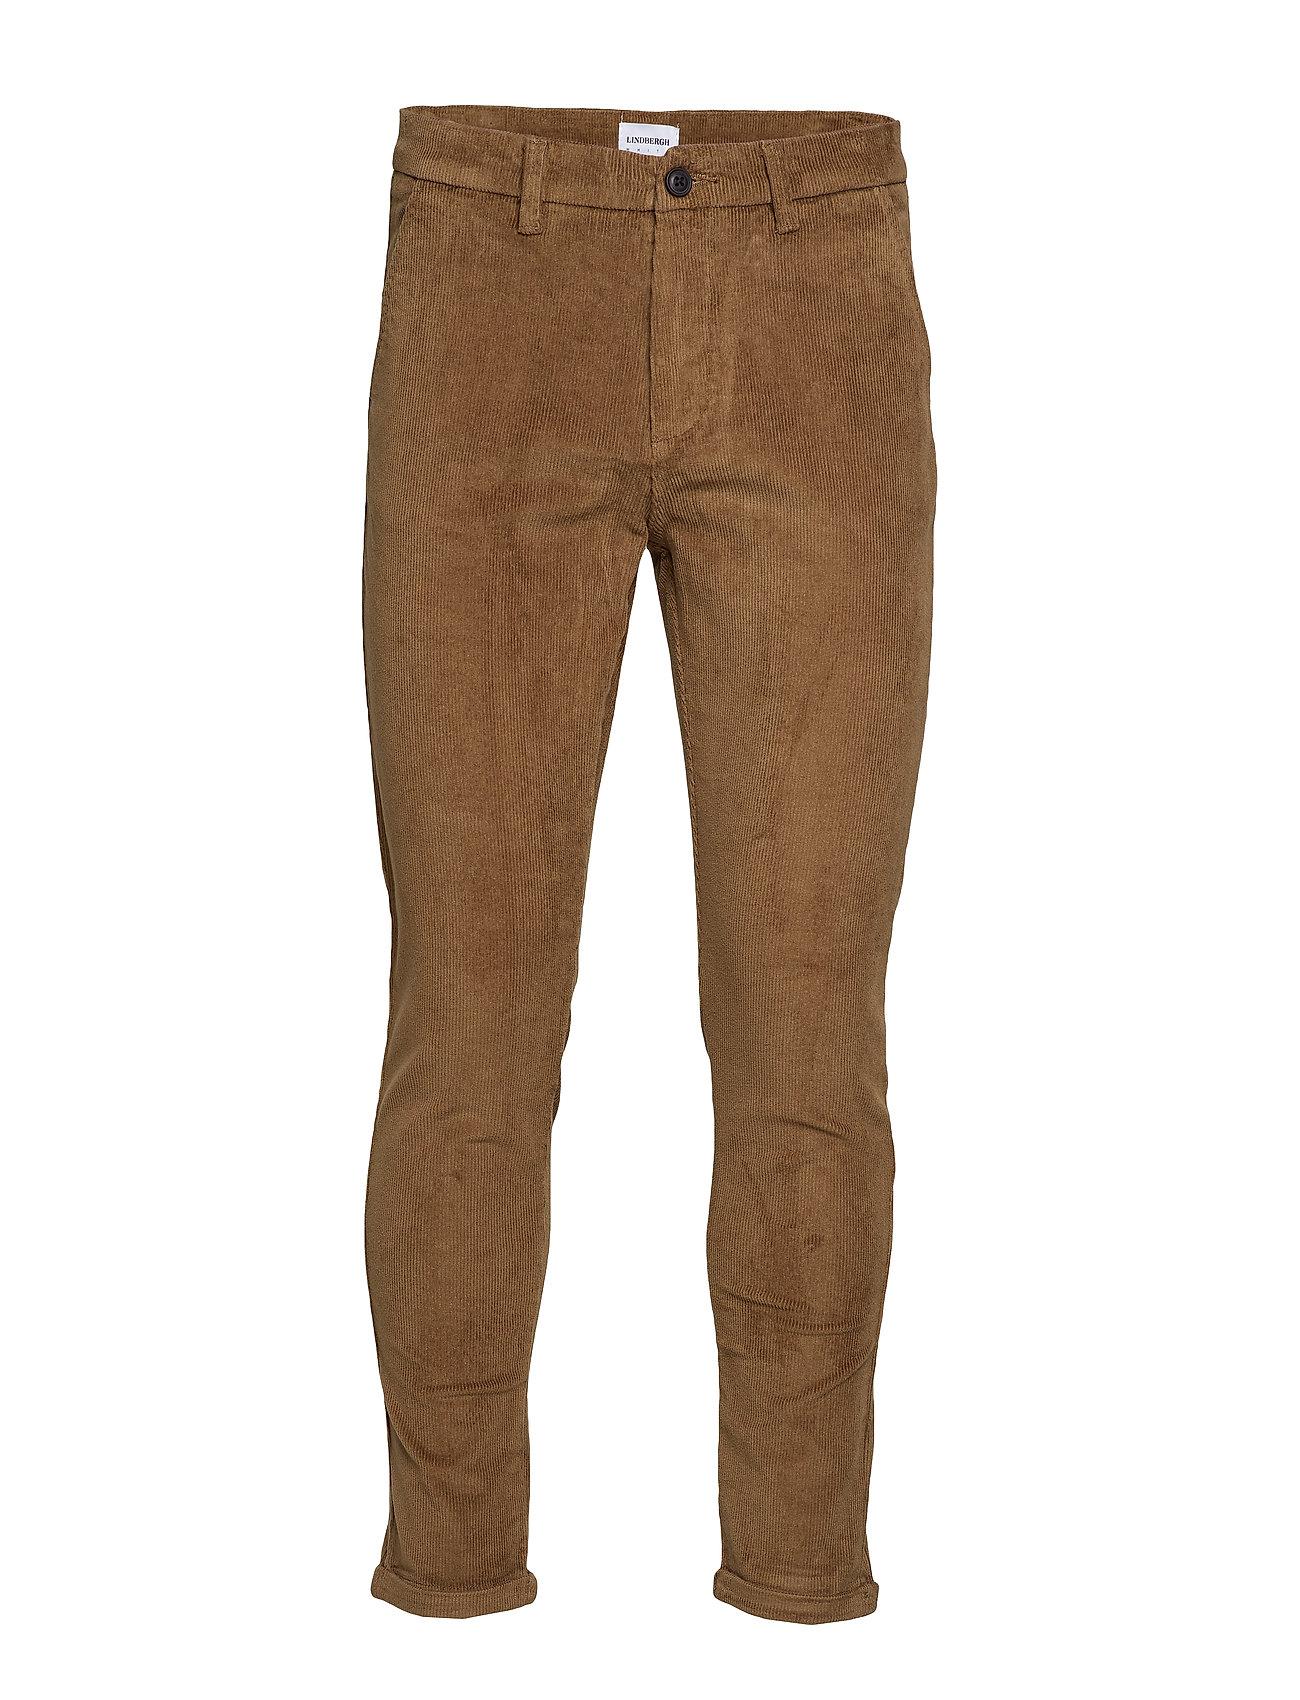 Lindbergh Cropped corduroy pants - SAND